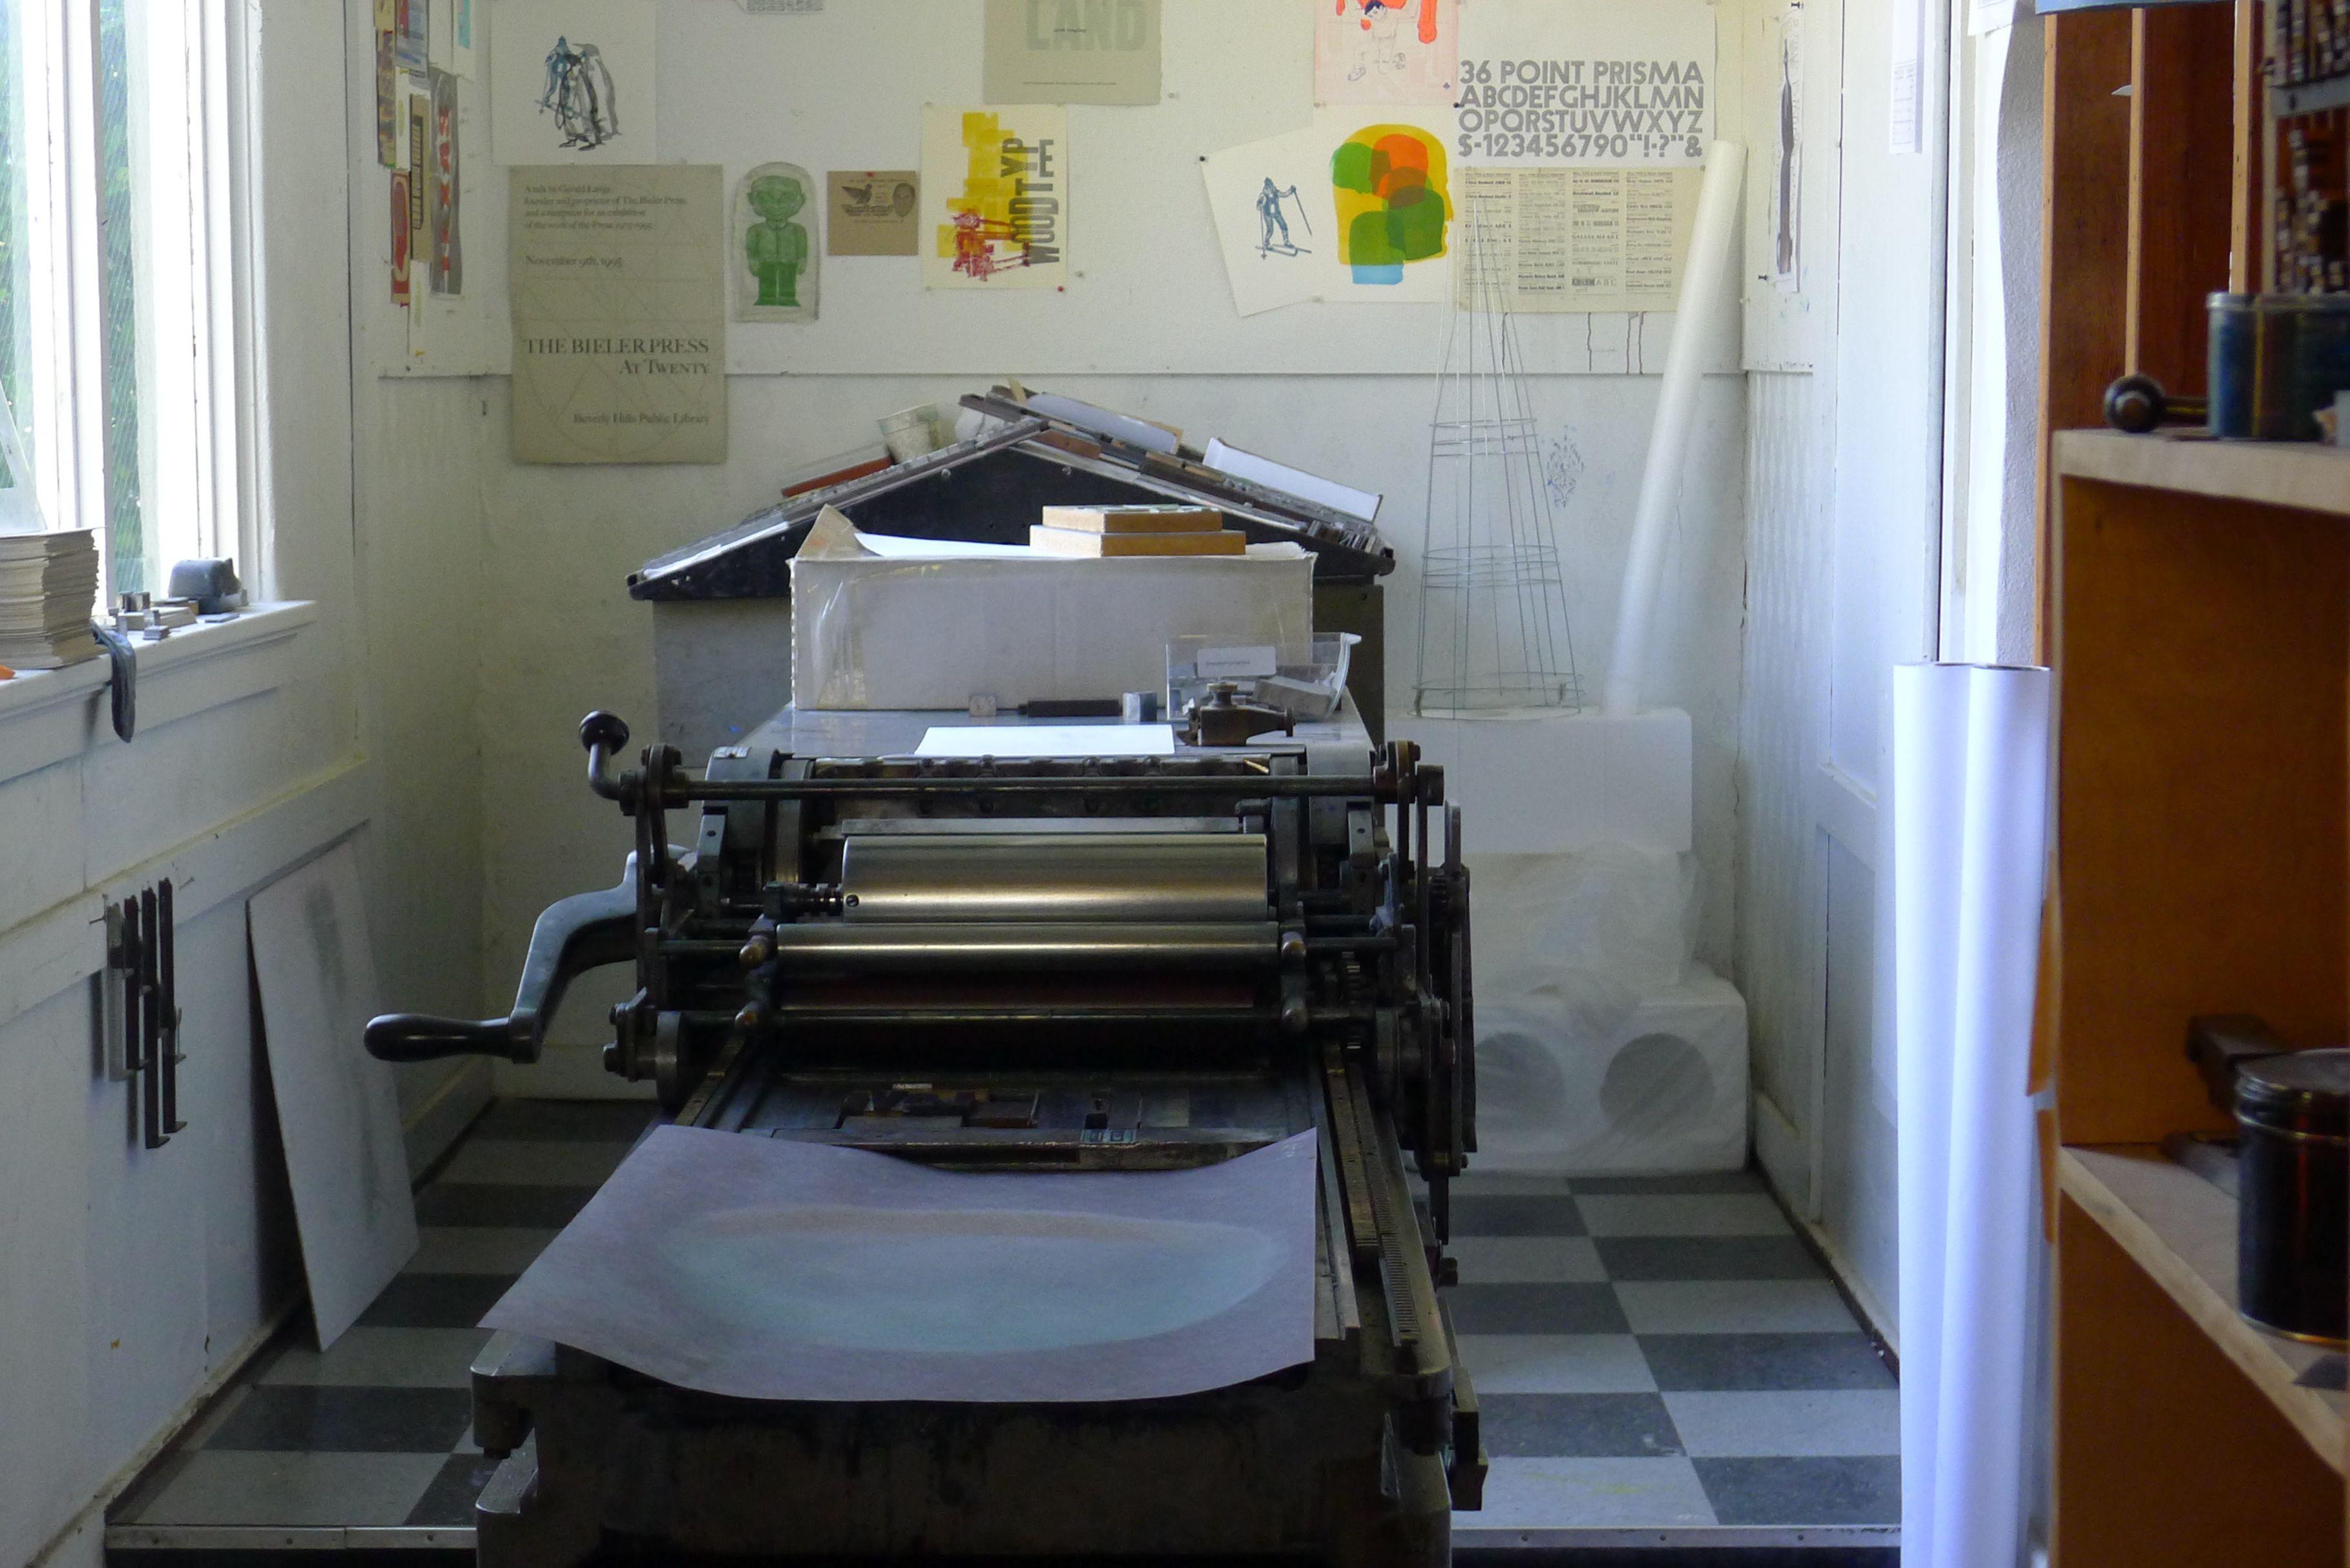 CCS Printing Press